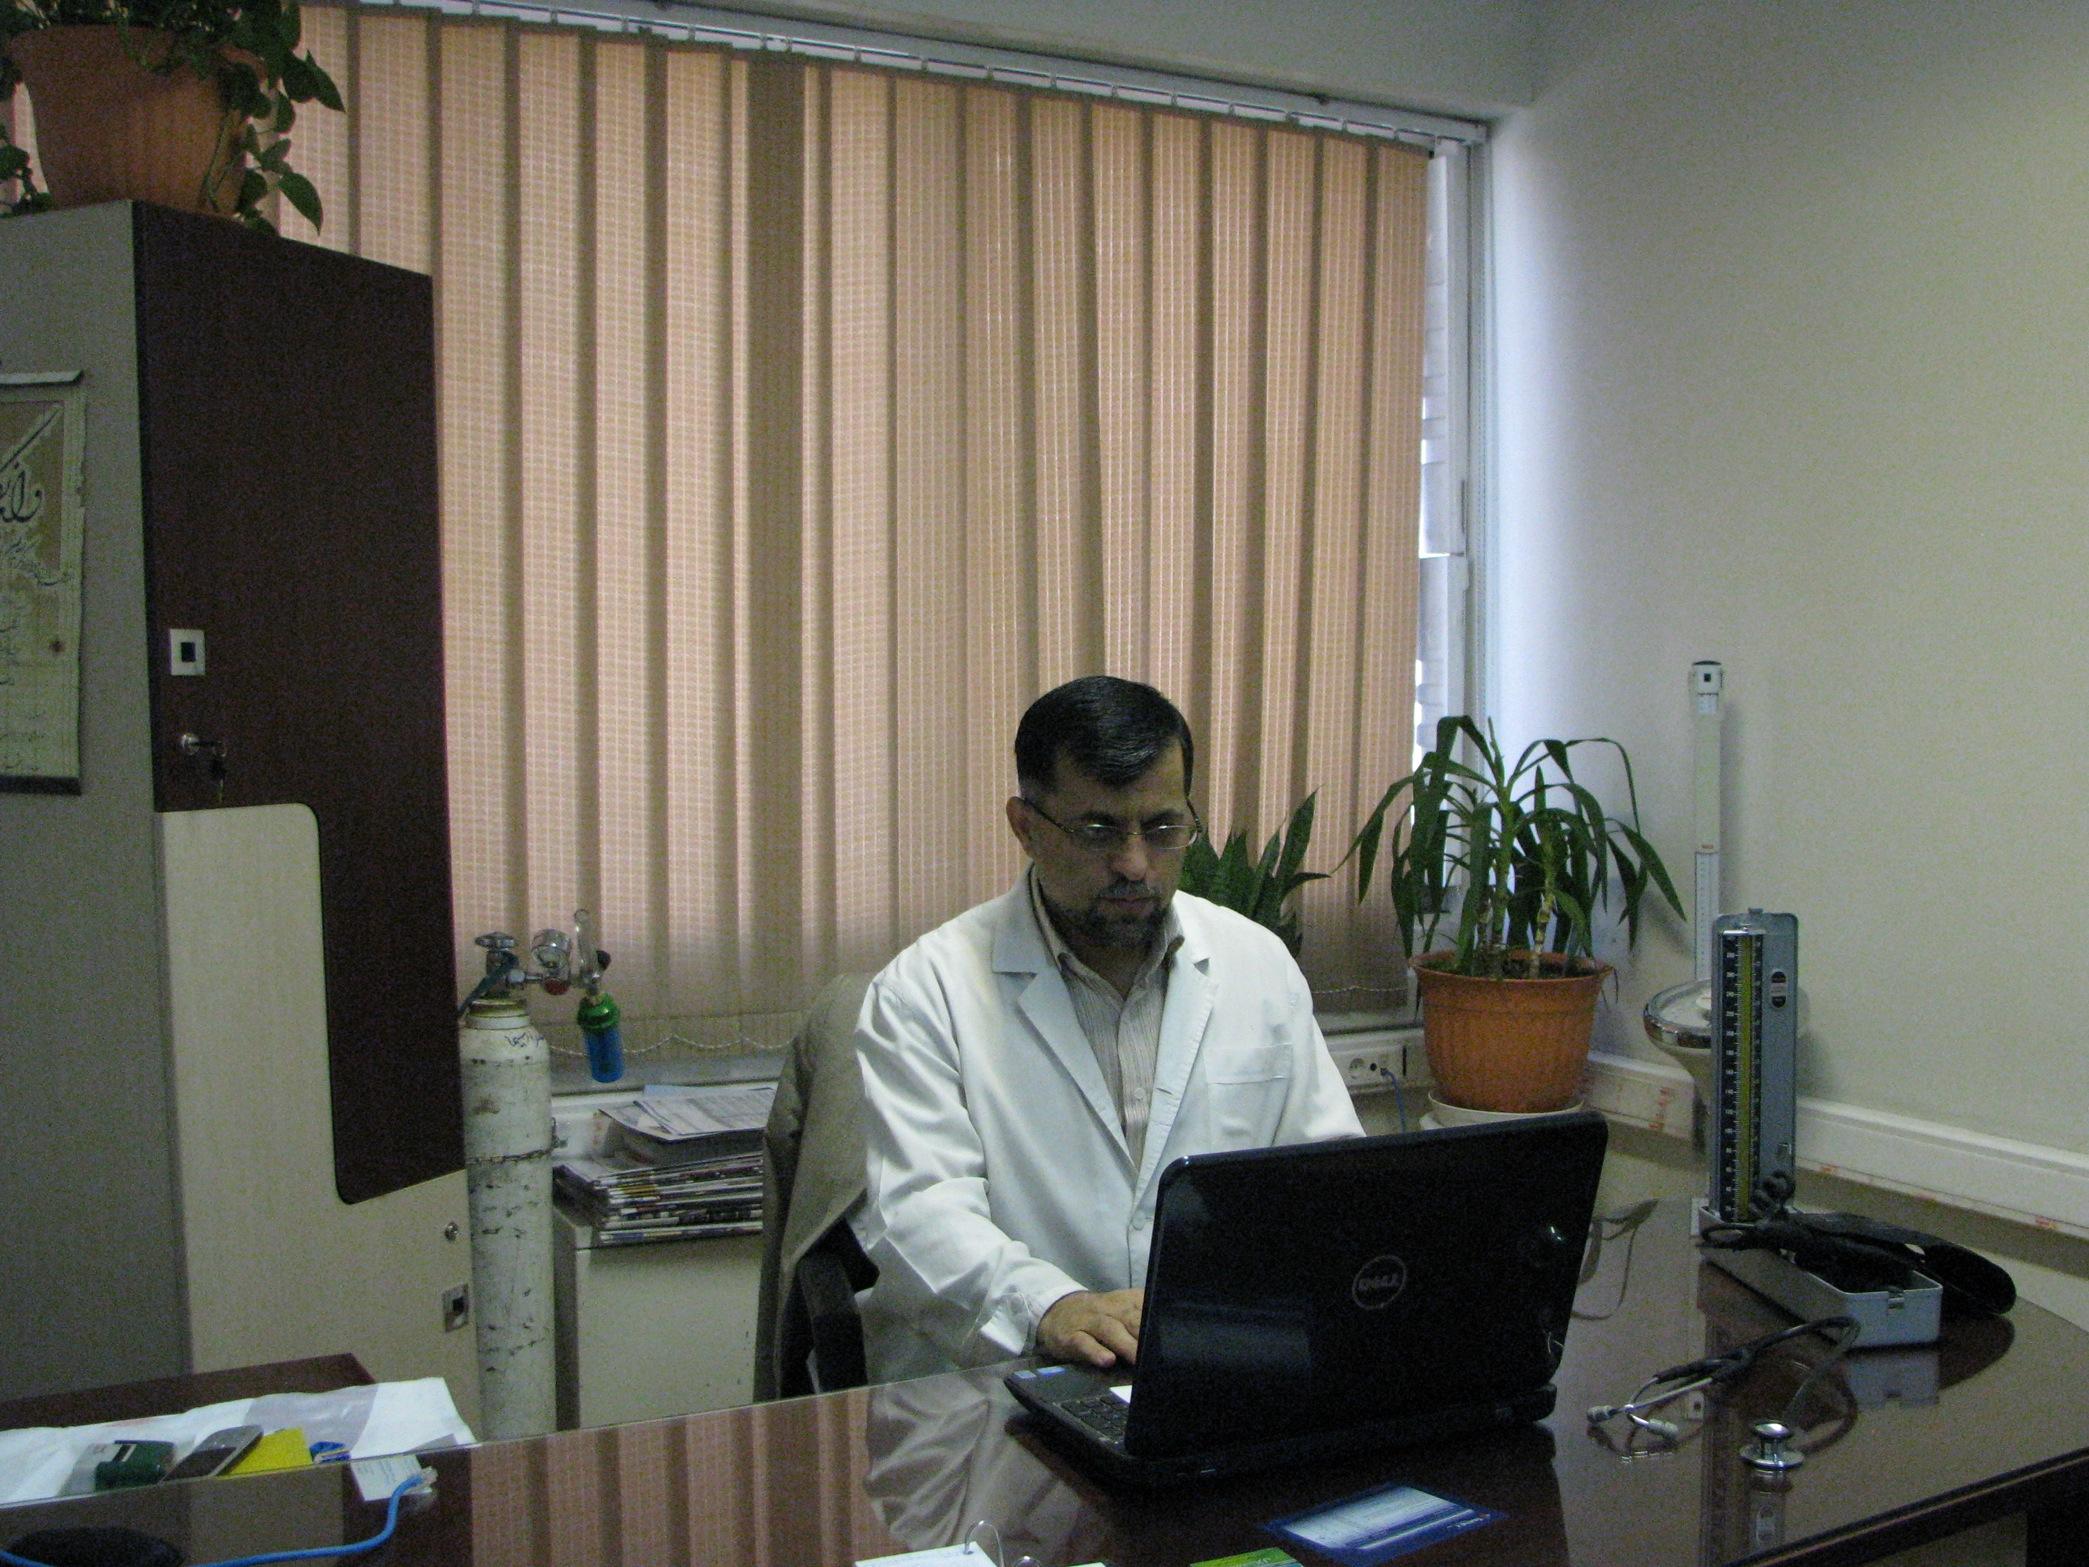 دکتر محمدمهدی اسعدی متخصص طب سوزنی کلینیک طب سوزنی تهران ایران